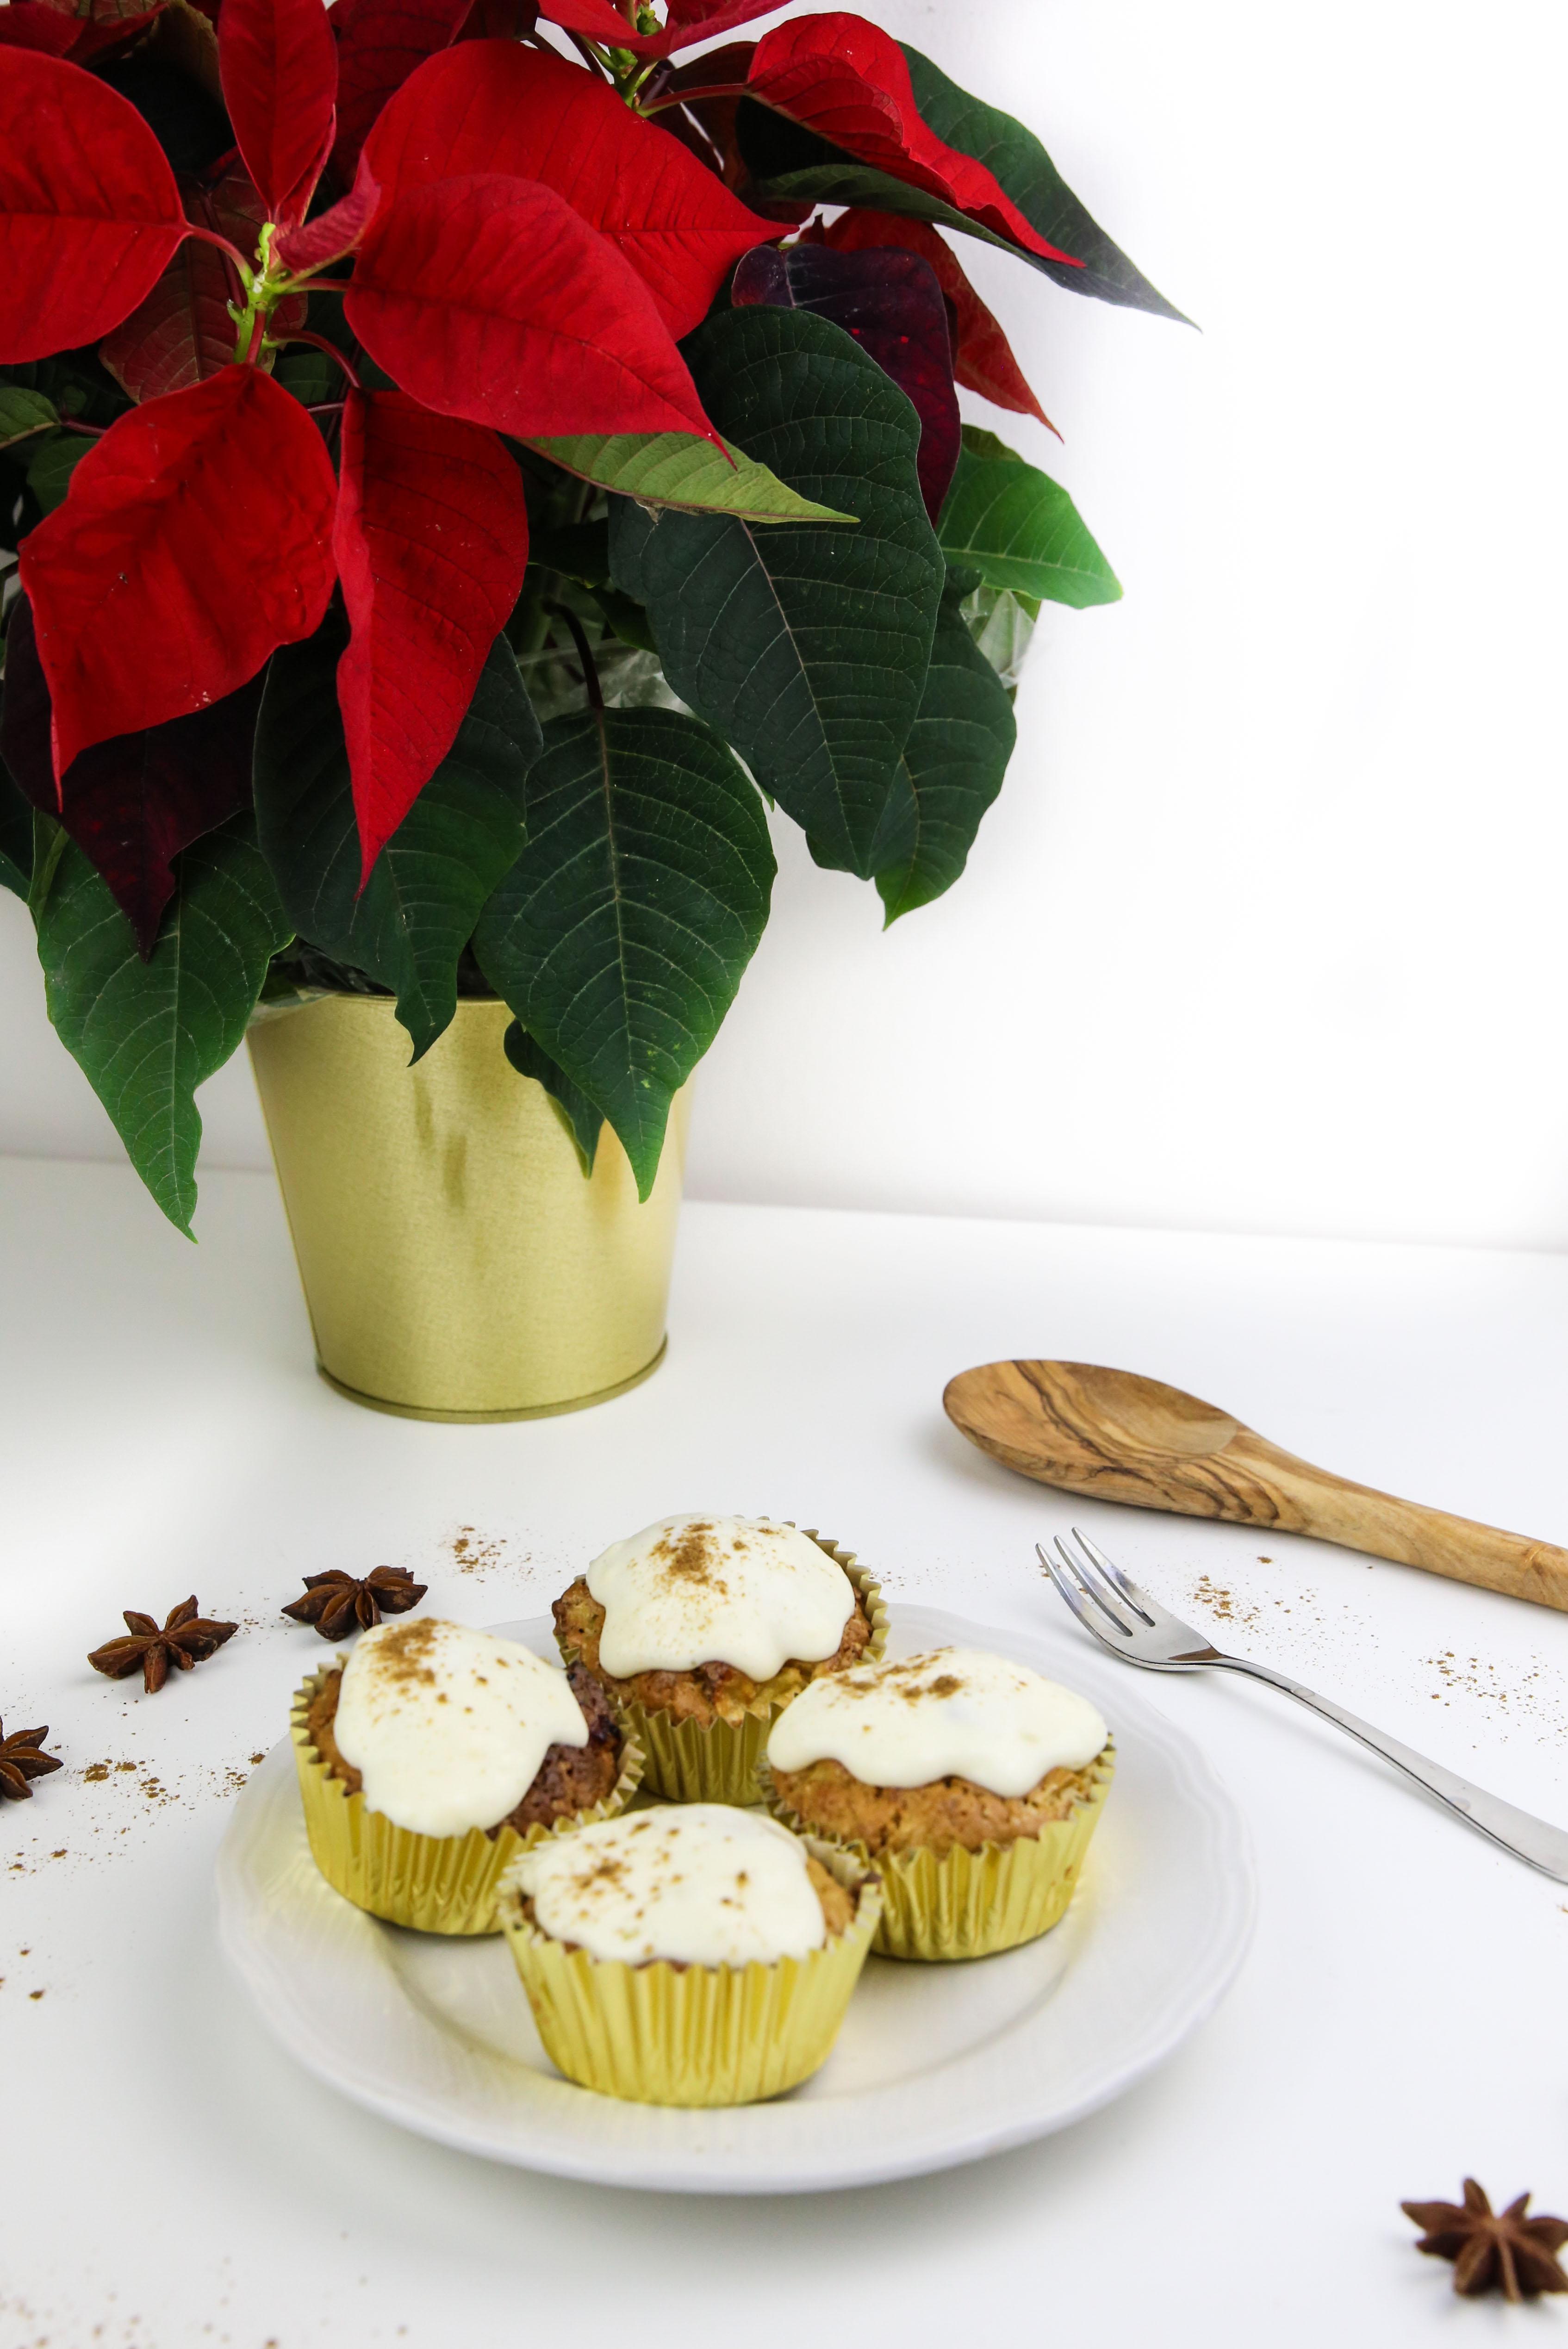 butternuss-kürbis-muffins-herbstliche-rezepte-backen-lecker-food-blog